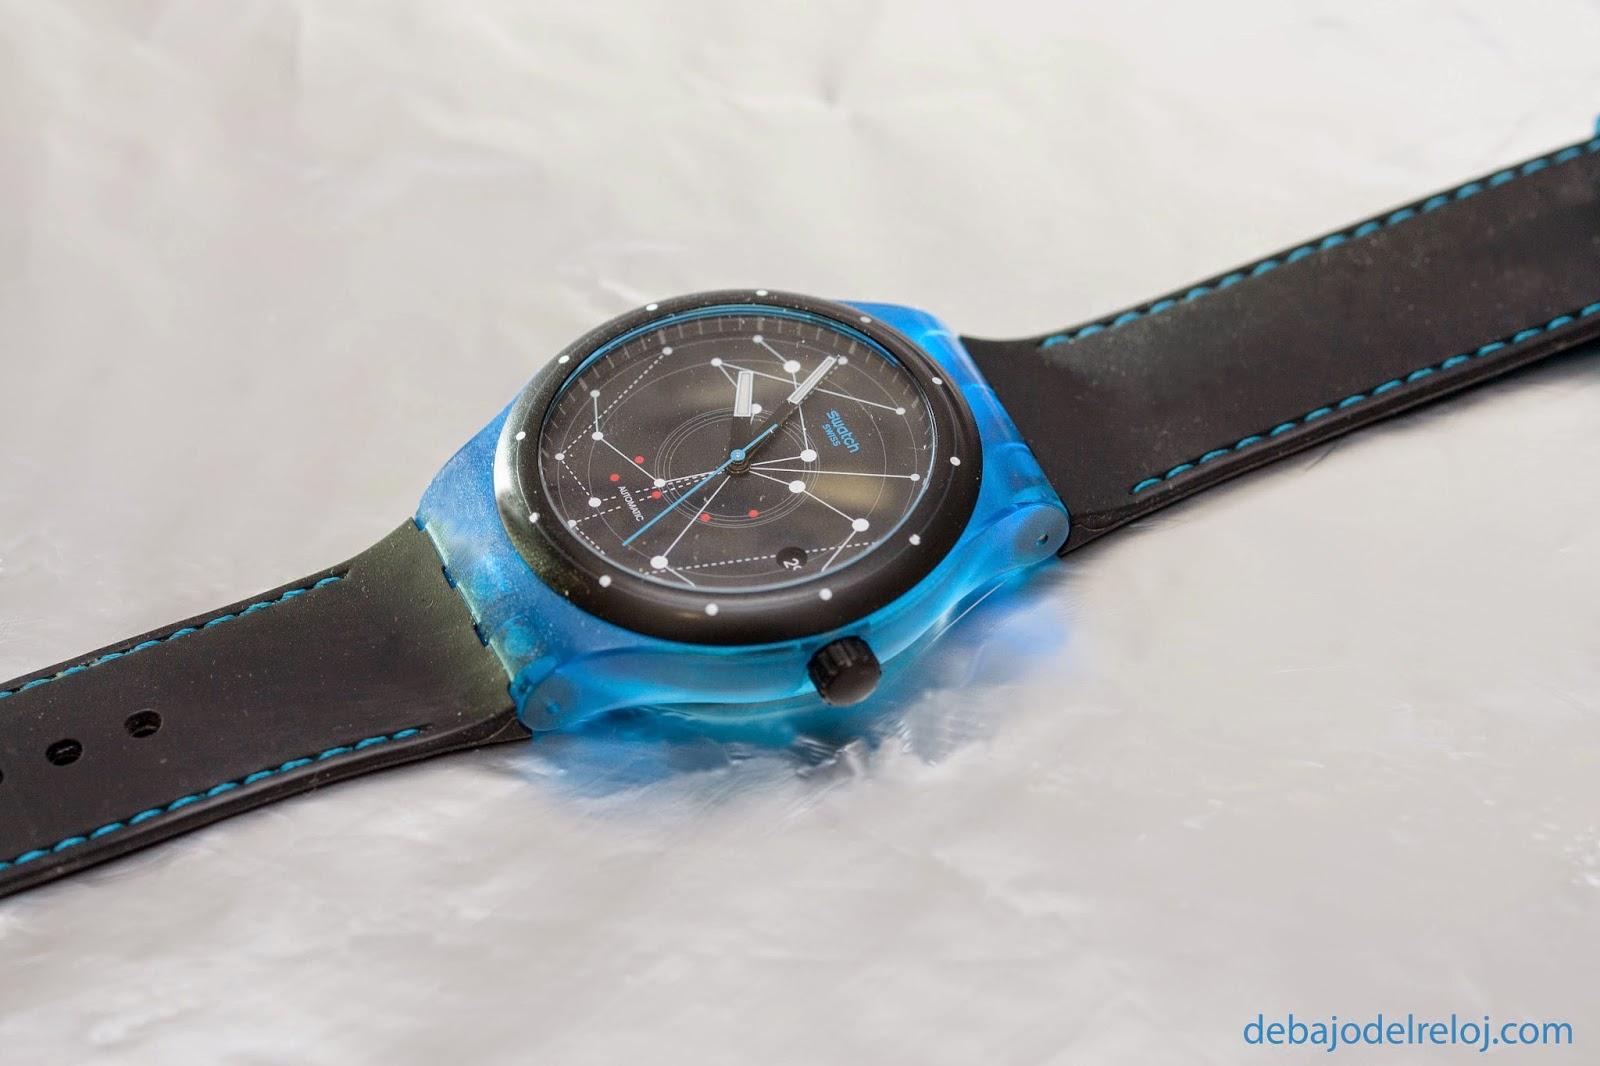 Uno de mis relojes: Swatch Sistem51 debajodelreloj2